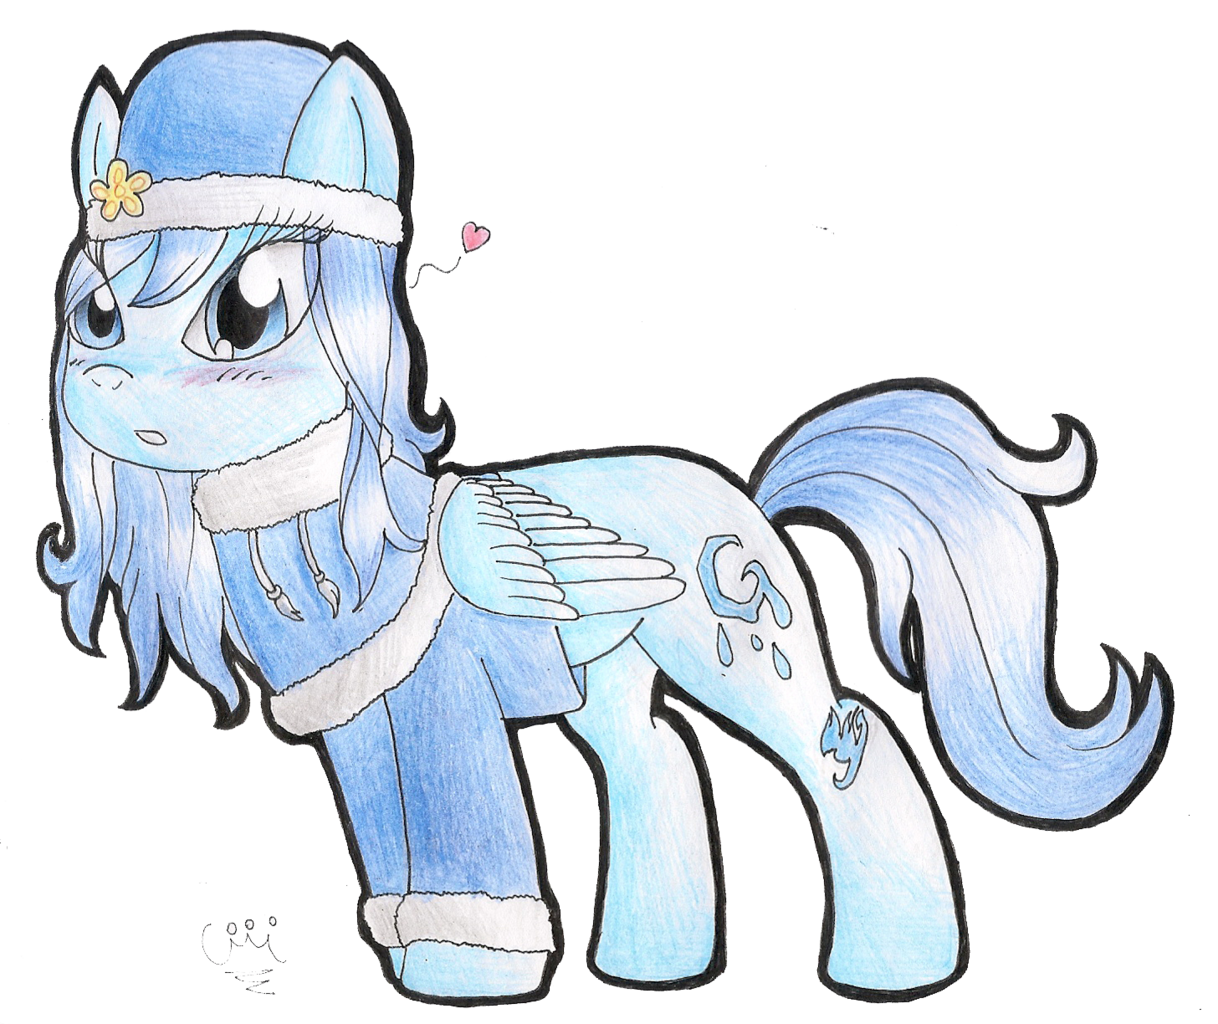 #904959 - artist:celecrypt, fairy tail, juvia lockser, ponified, safe, solo, traditional art, transparent background - Derpibooru - My Little Pony: Friendship is Magic Imageboard